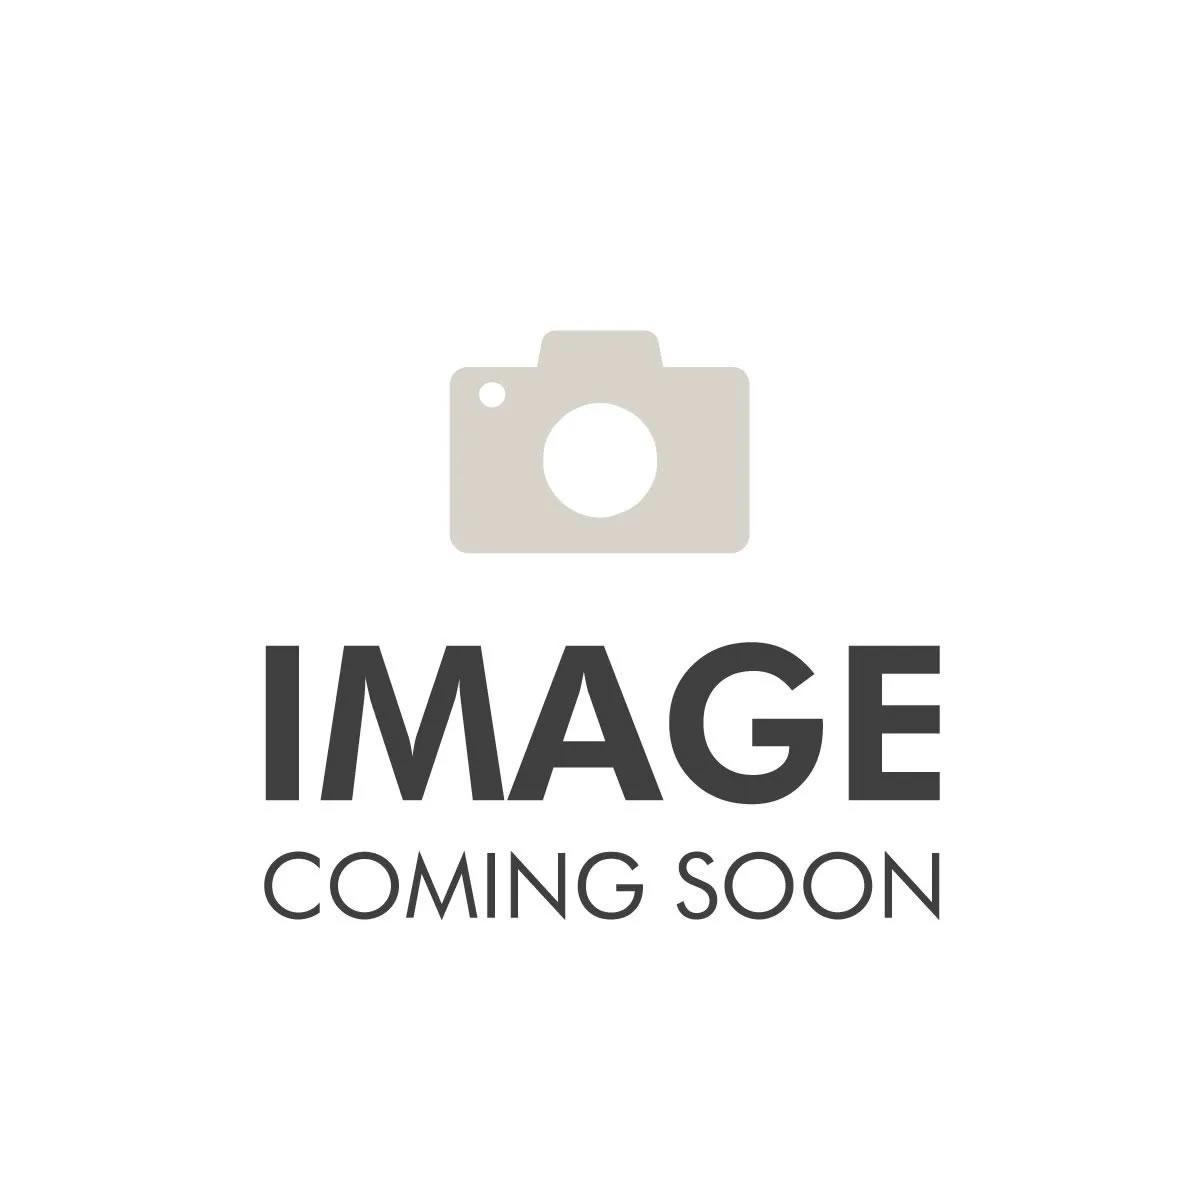 Floor Liners, Kit, Black; 02-14 Dodge Ram 1500/2500/3500 Quad Cab